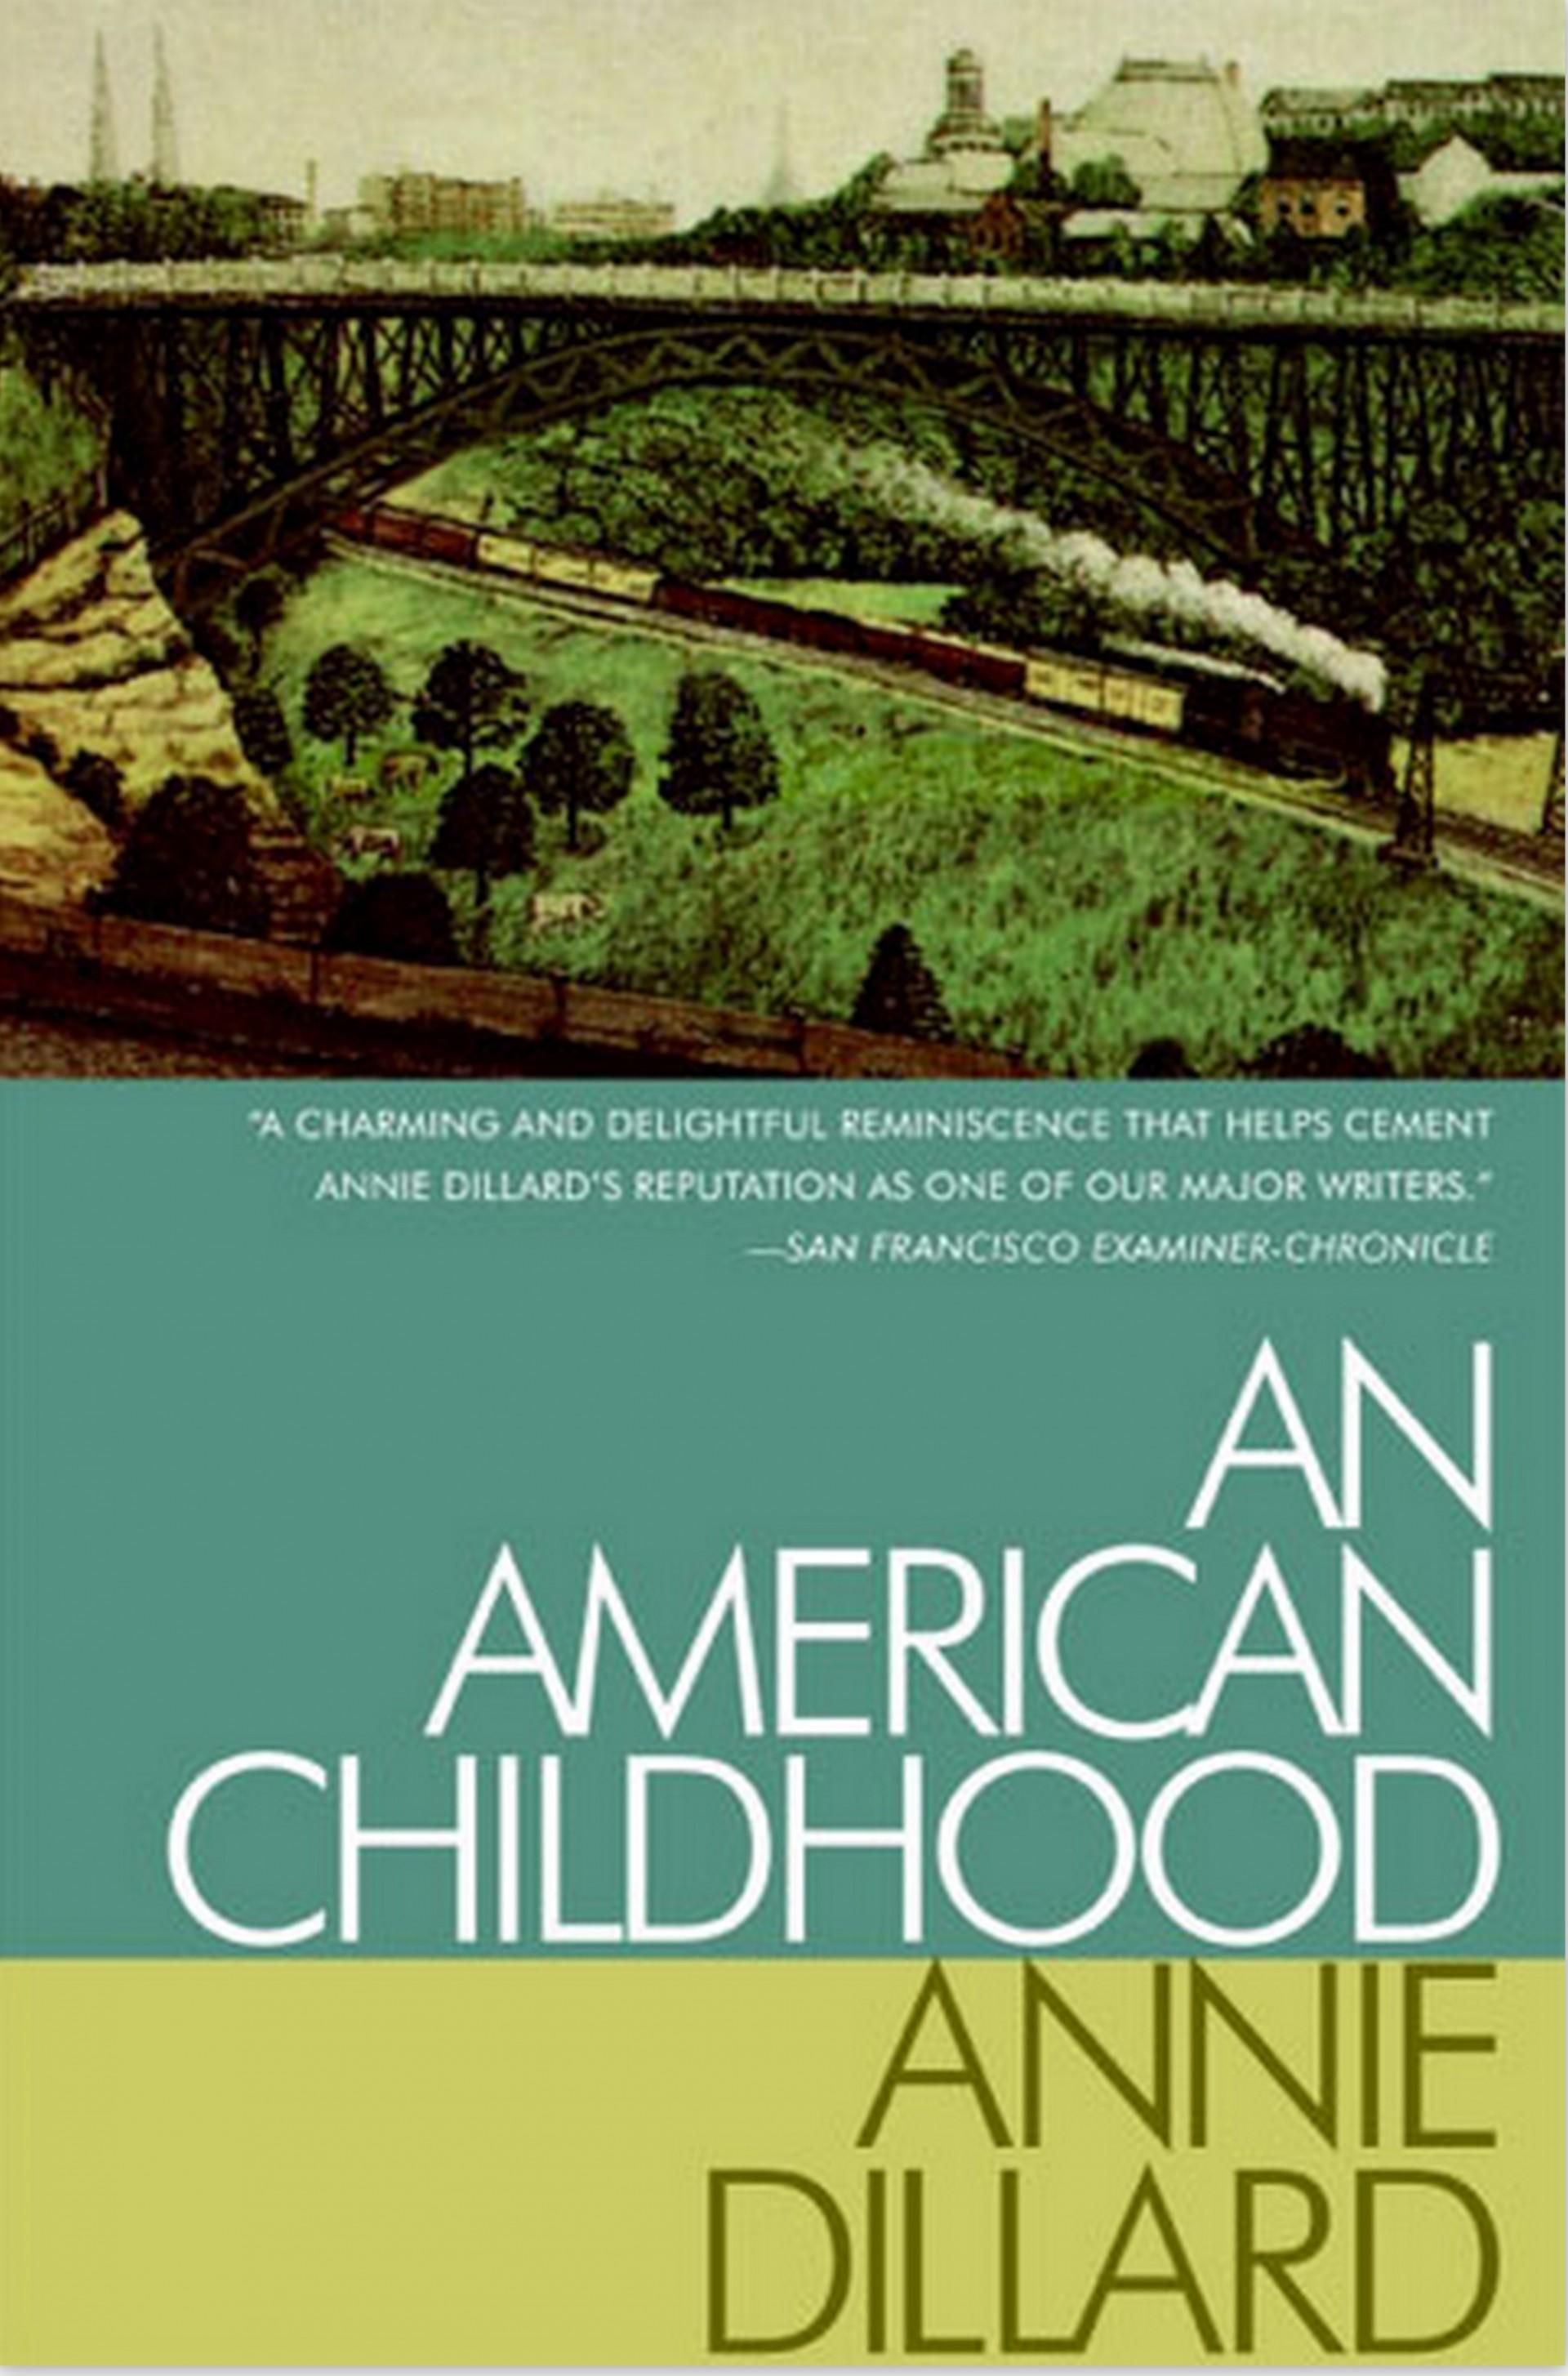 012 Annie Dillard An American Childhood Essays Essay Stirring Stunt Pilot Pdf 1920